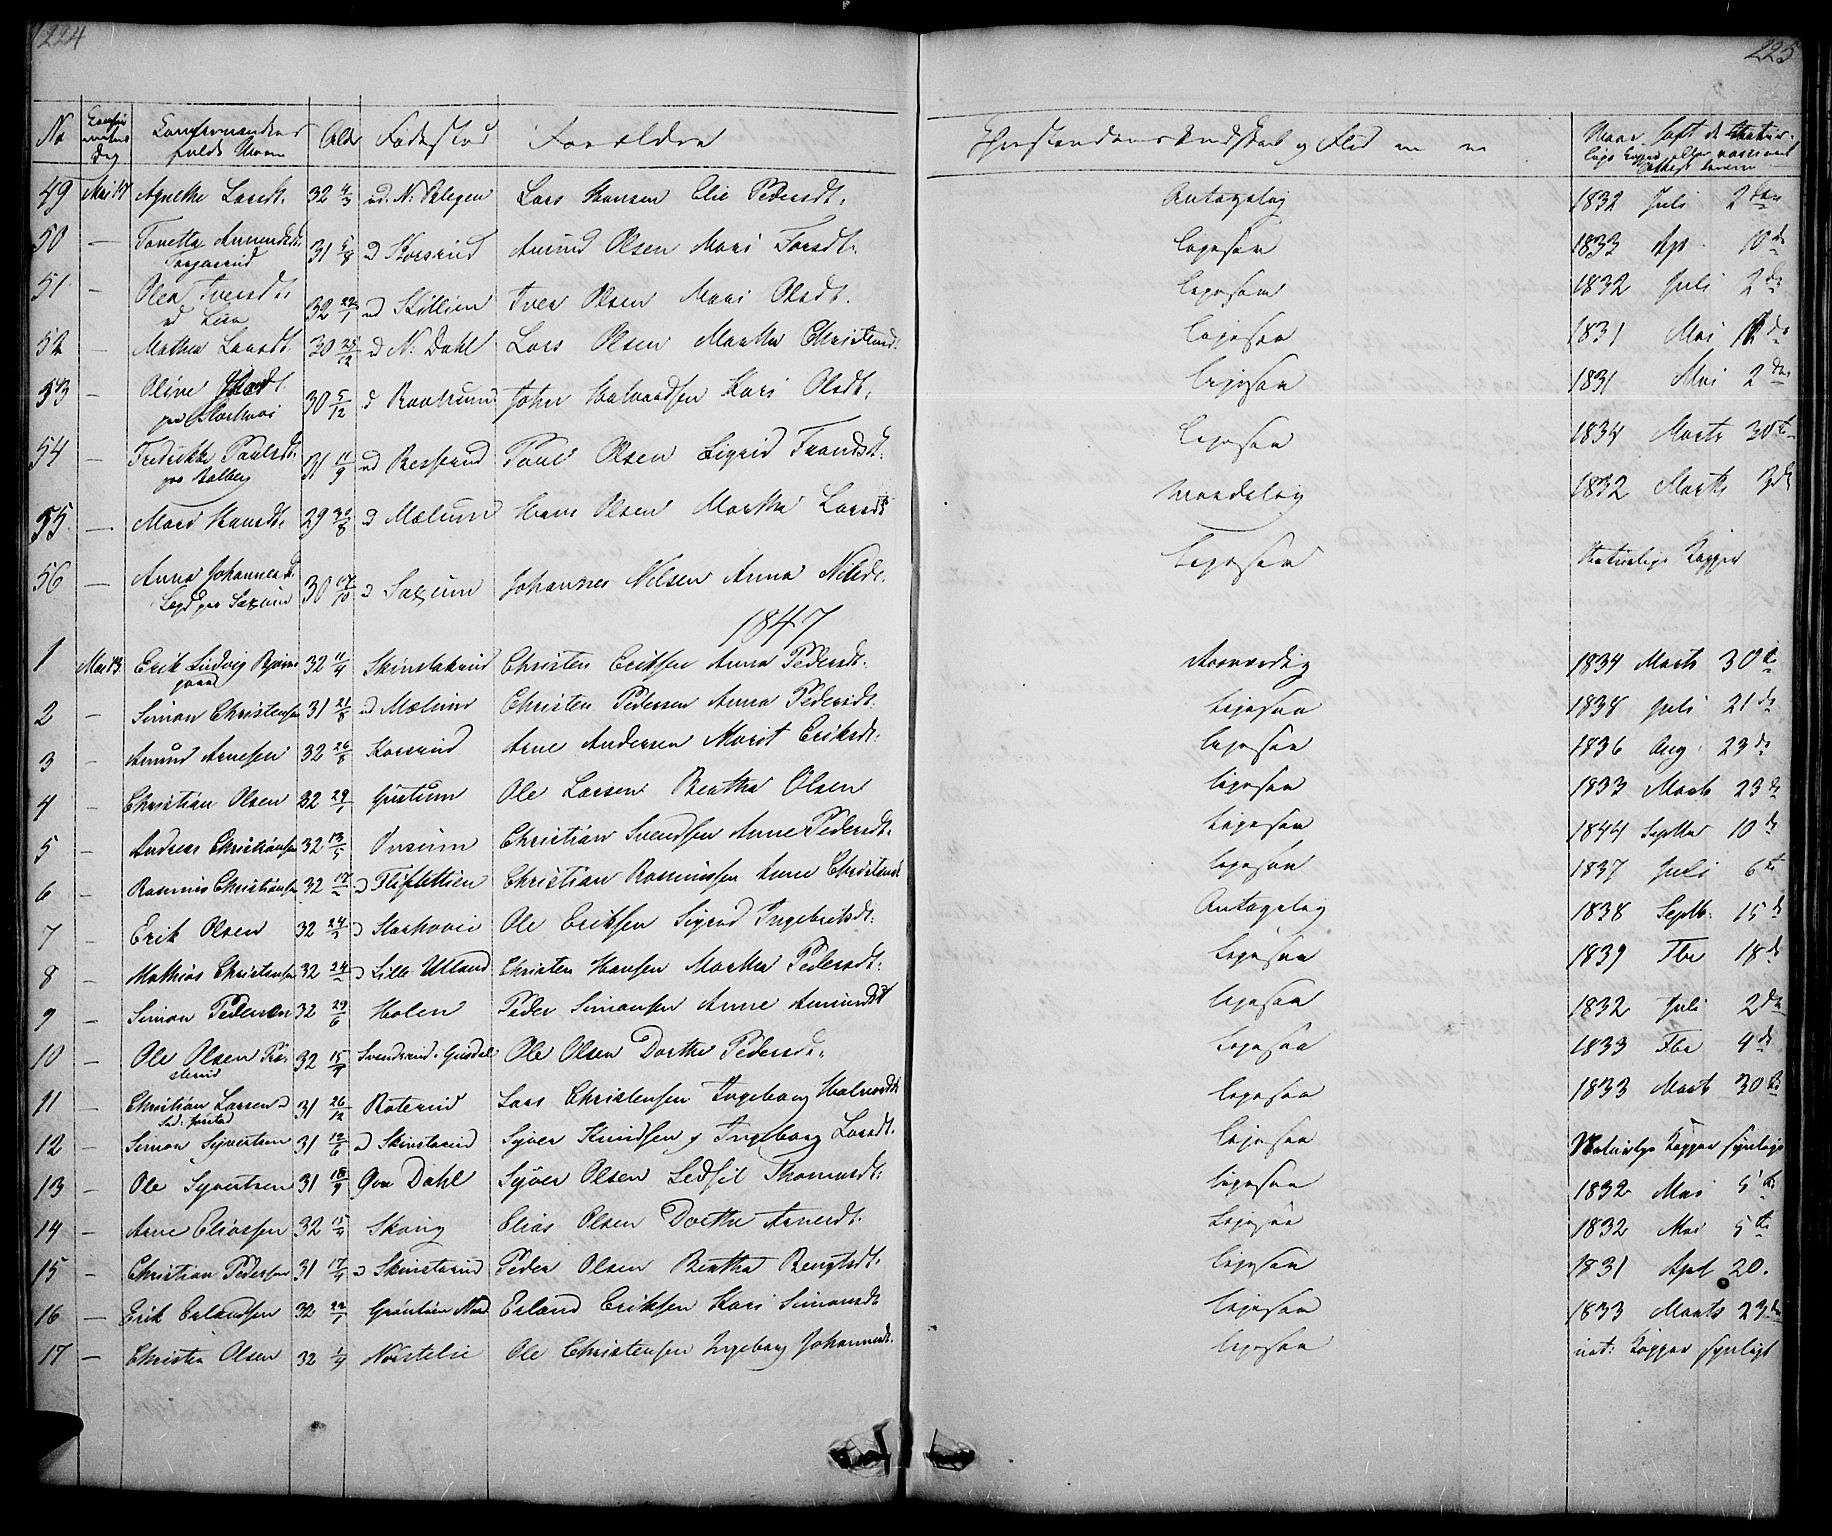 SAH, Fåberg prestekontor, Klokkerbok nr. 5, 1837-1864, s. 224-225